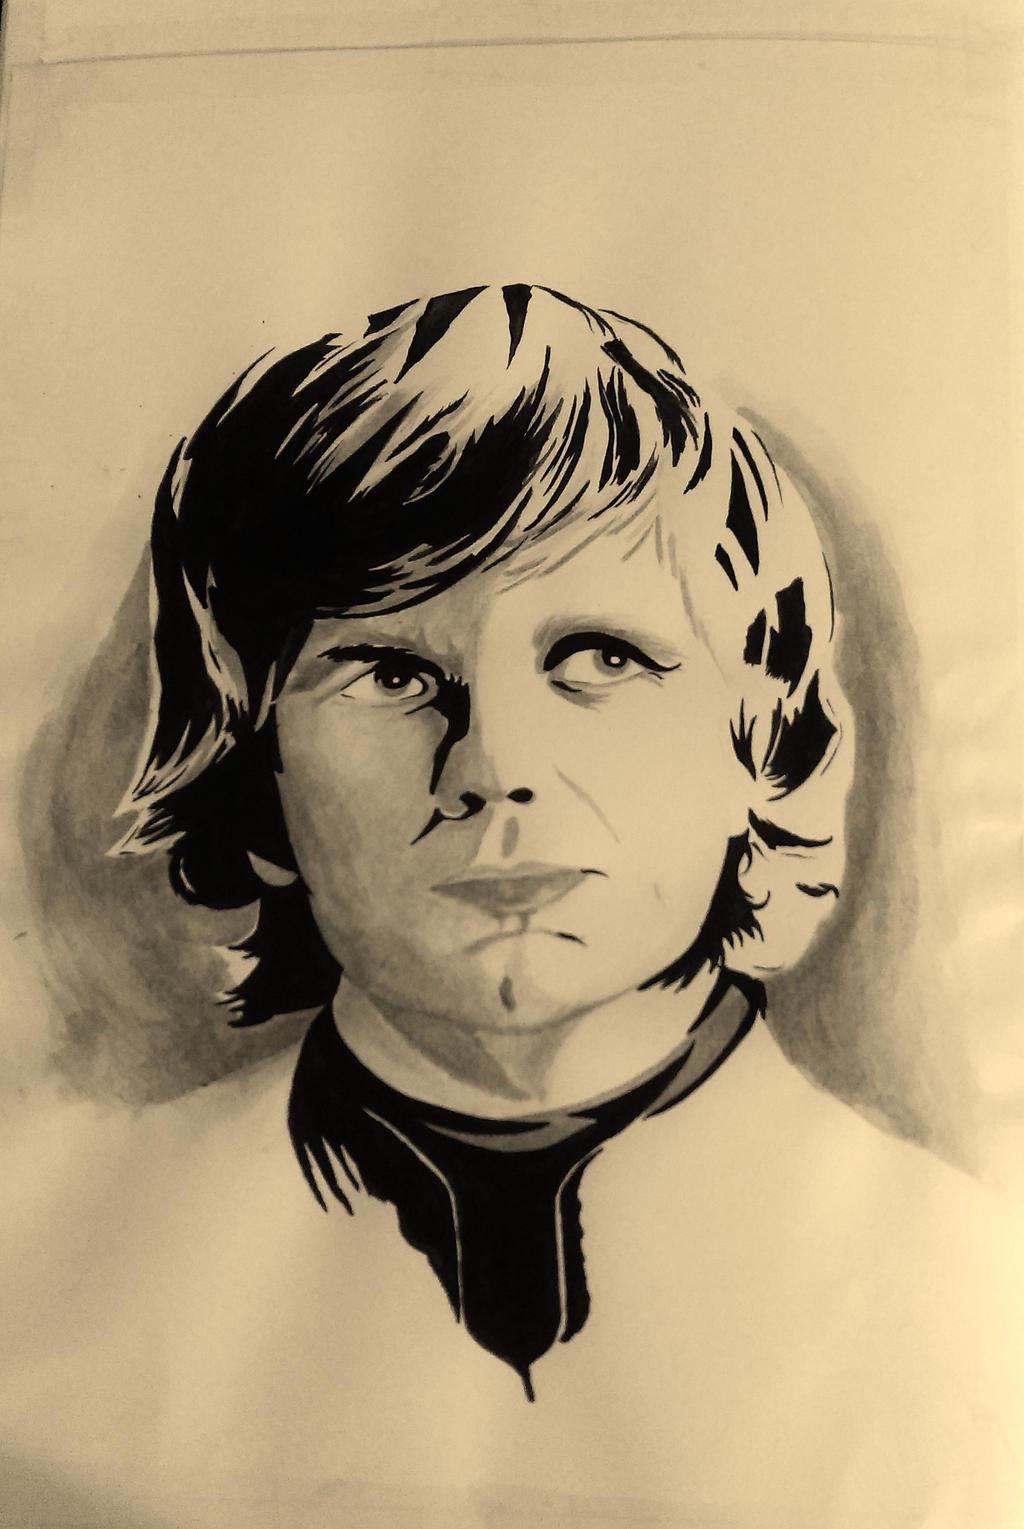 Tyrion Lannister in Ink by KayleniaArt